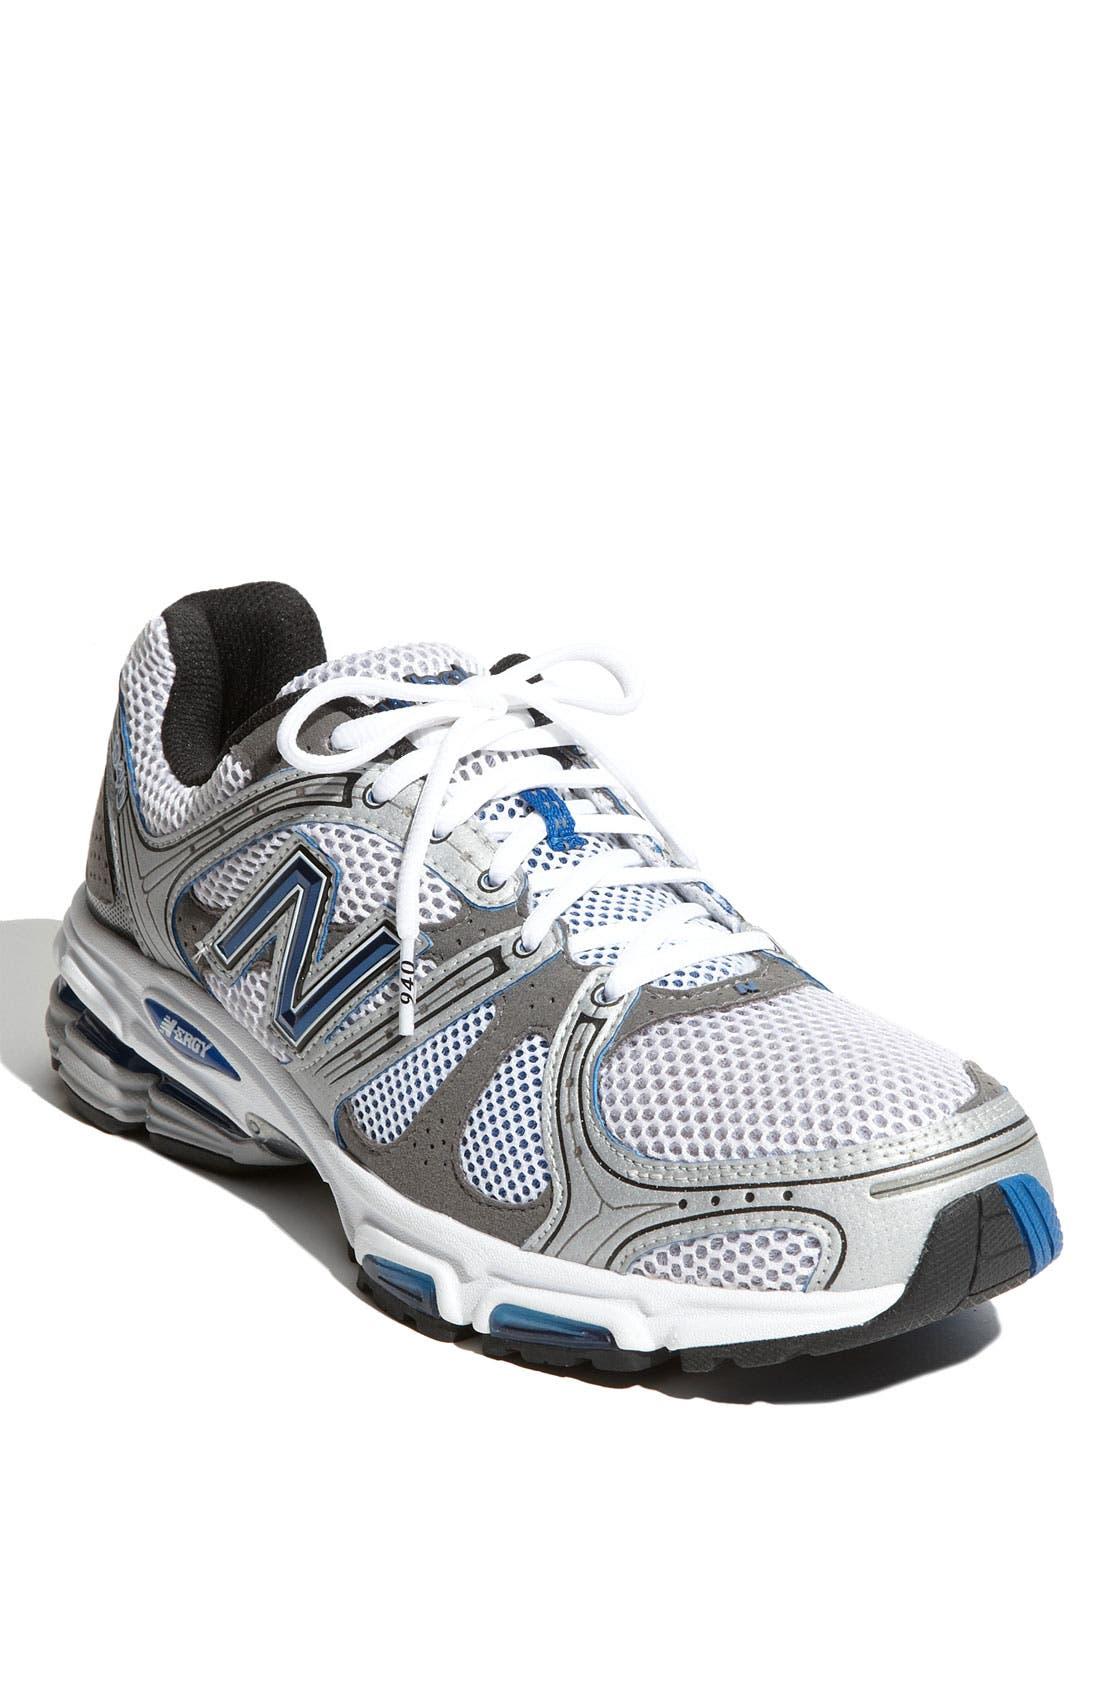 Alternate Image 1 Selected - New Balance '940' Running Shoe (Men) (Online Only)